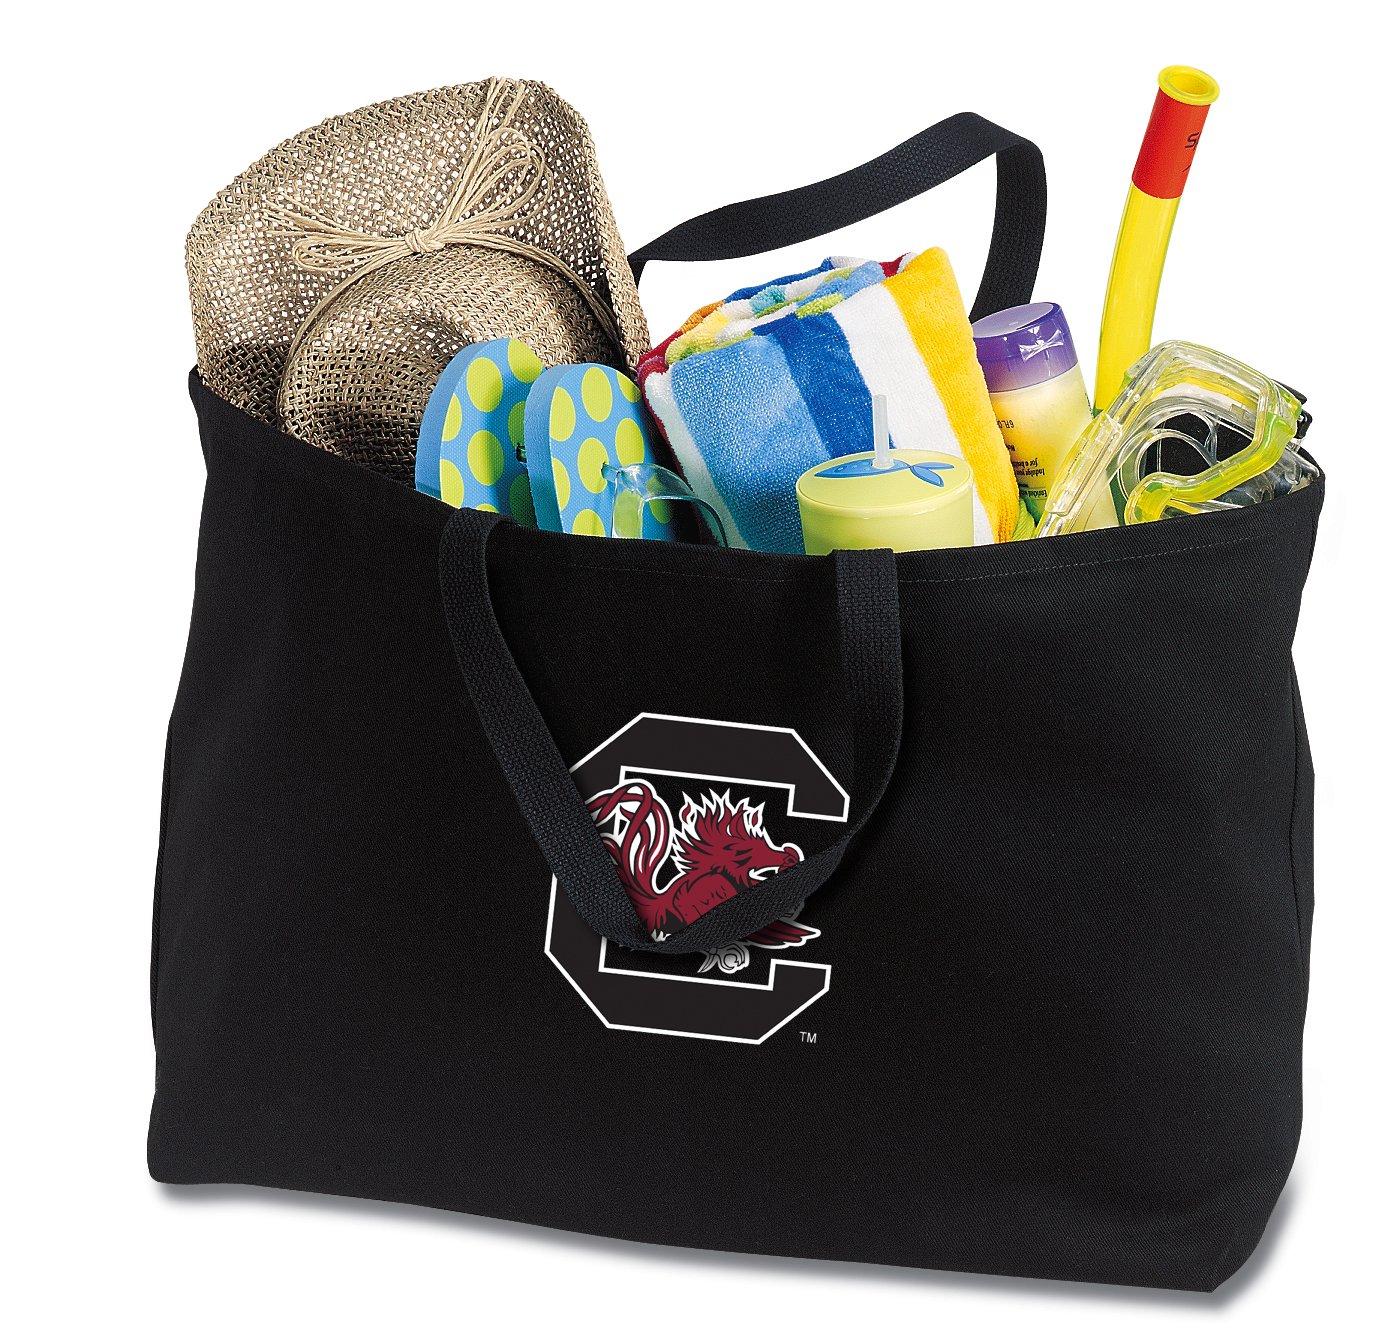 JUMBO South Carolina Tote Bag or Large Canvas University of South Carolina Shopping Bag